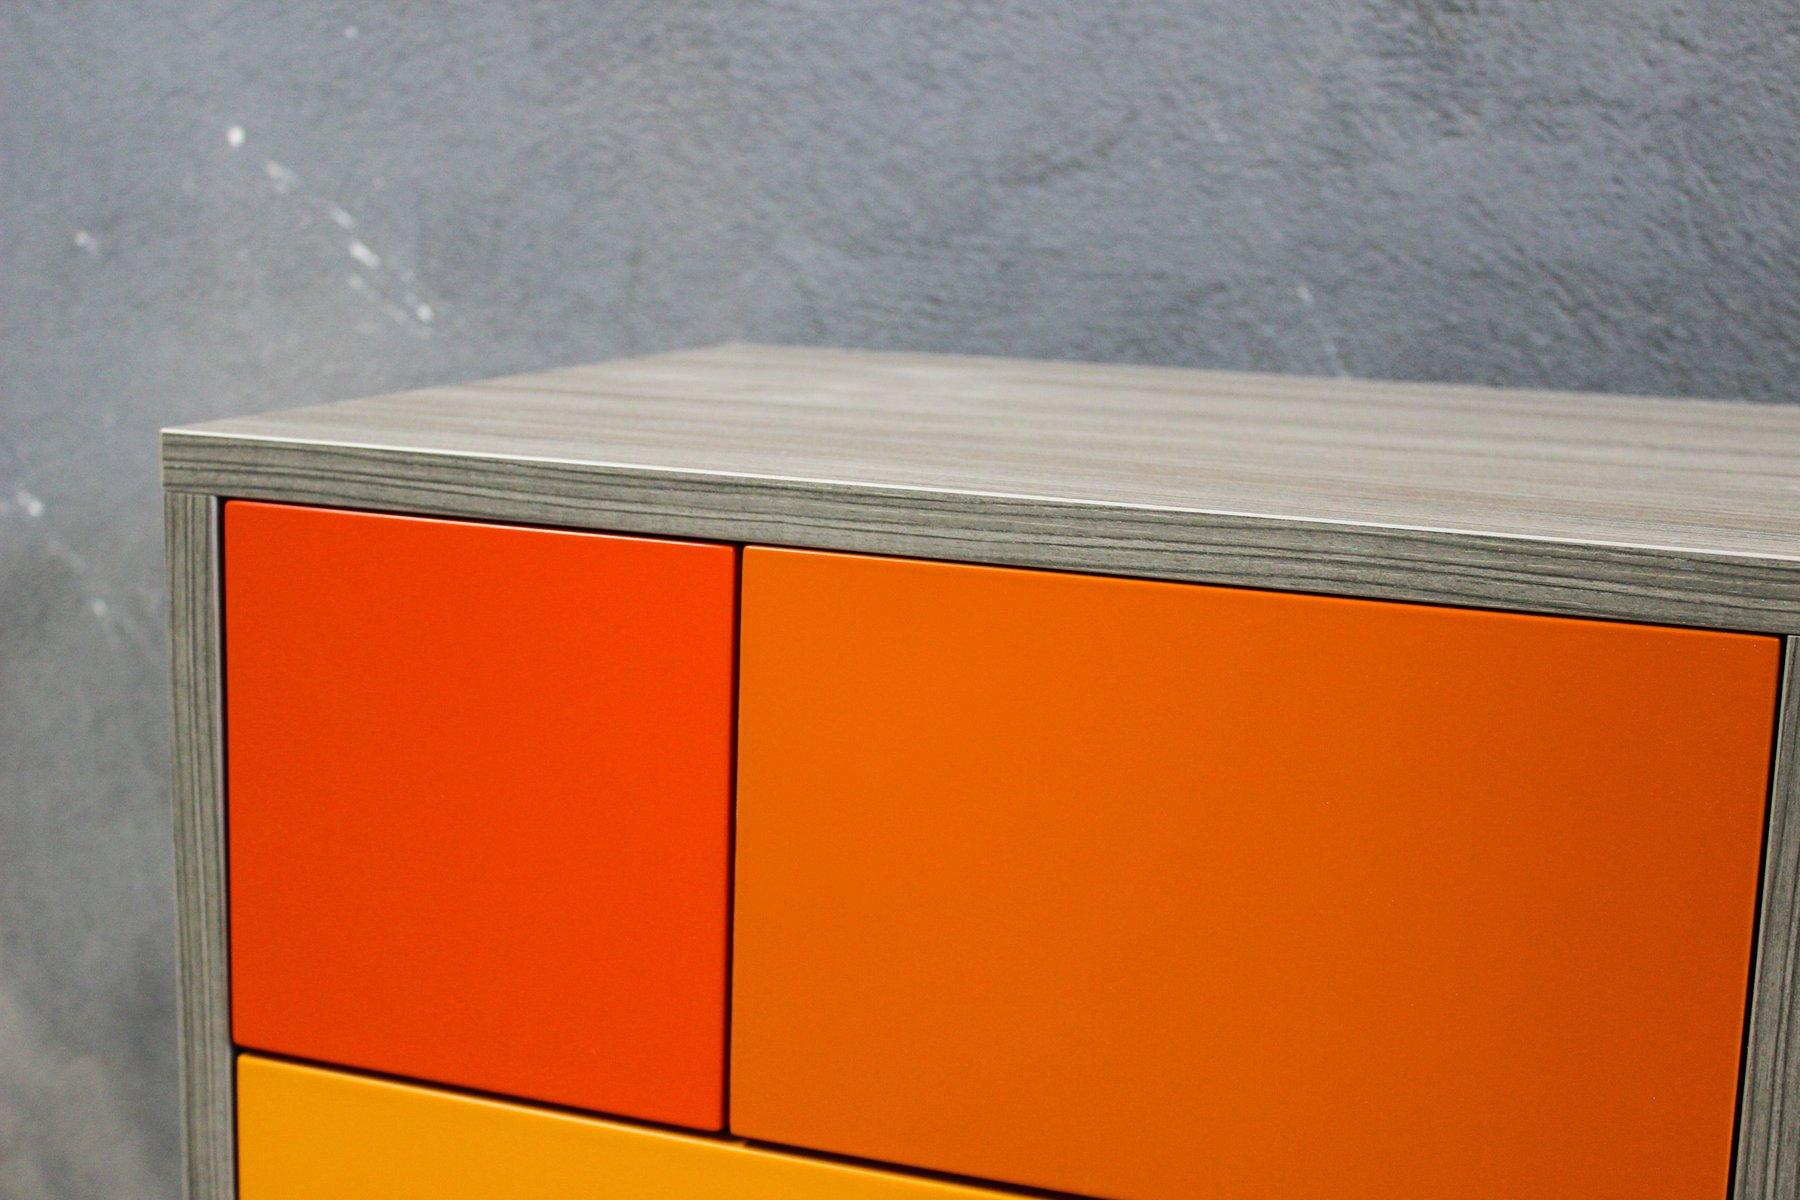 Orange real sideboard by studio deusdara for sale at pamono for Sideboard real